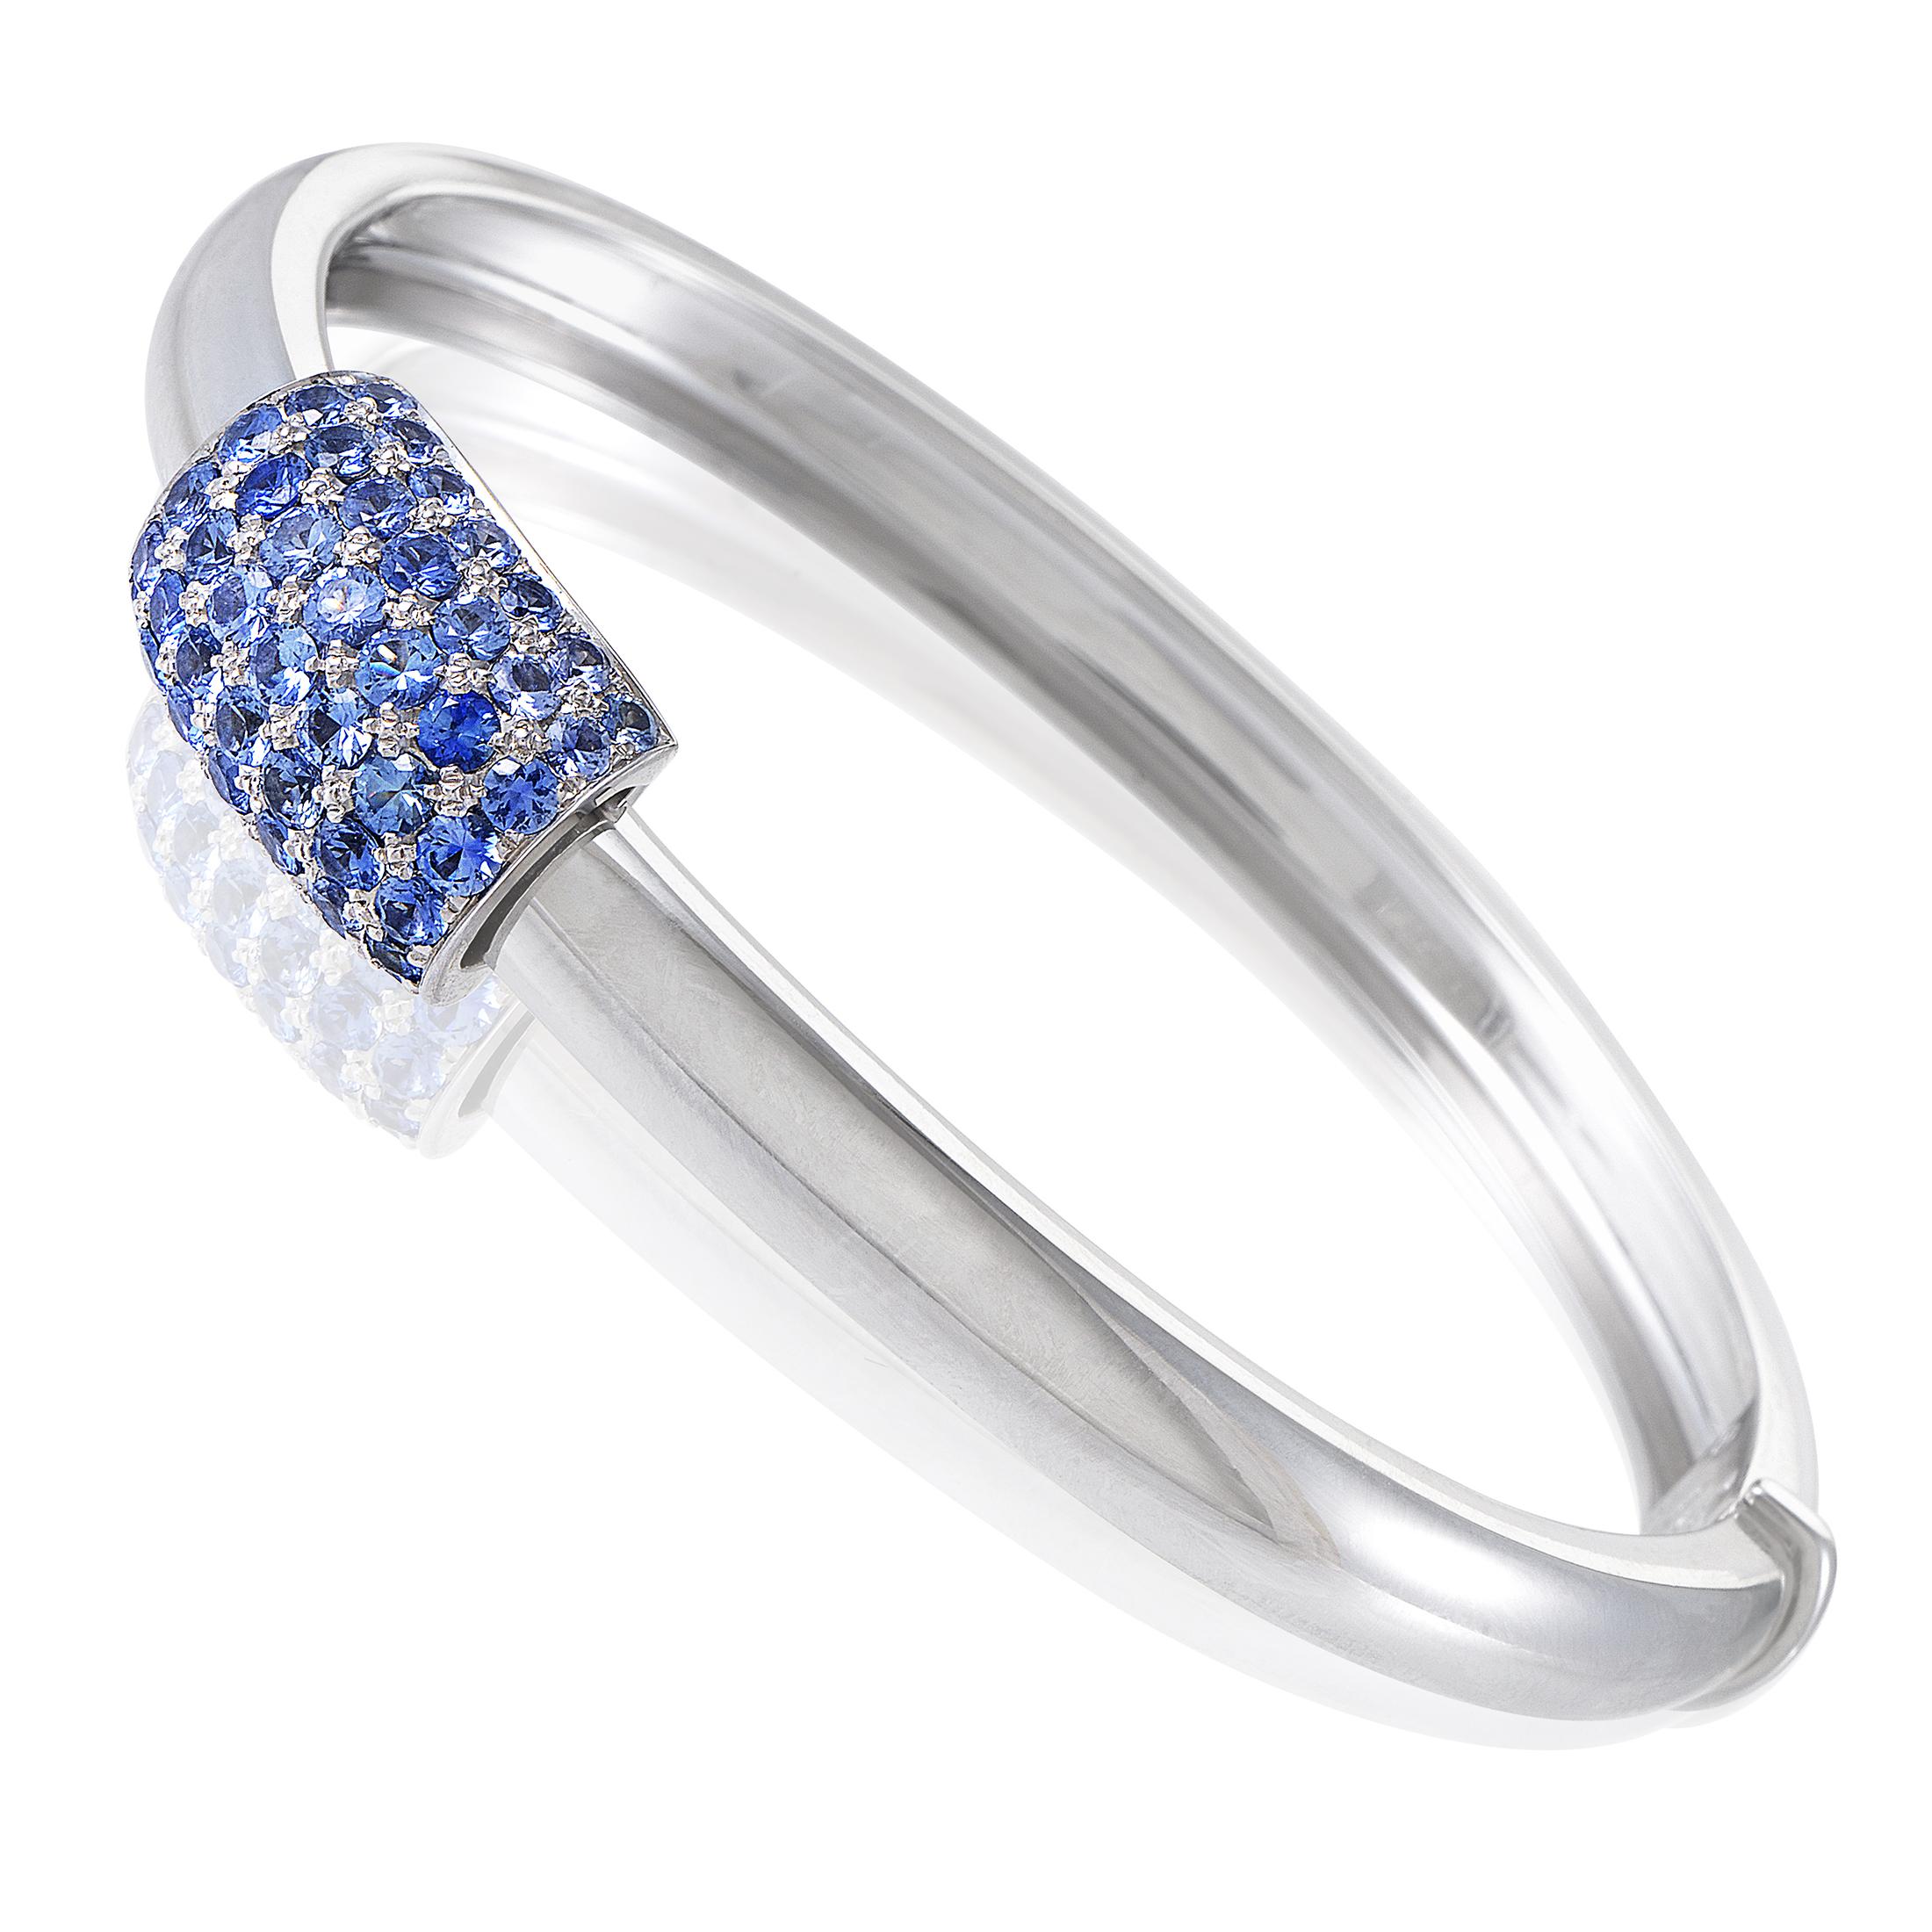 Piaget Women's 18K White Gold Blue Sapphire Bangle Bracelet